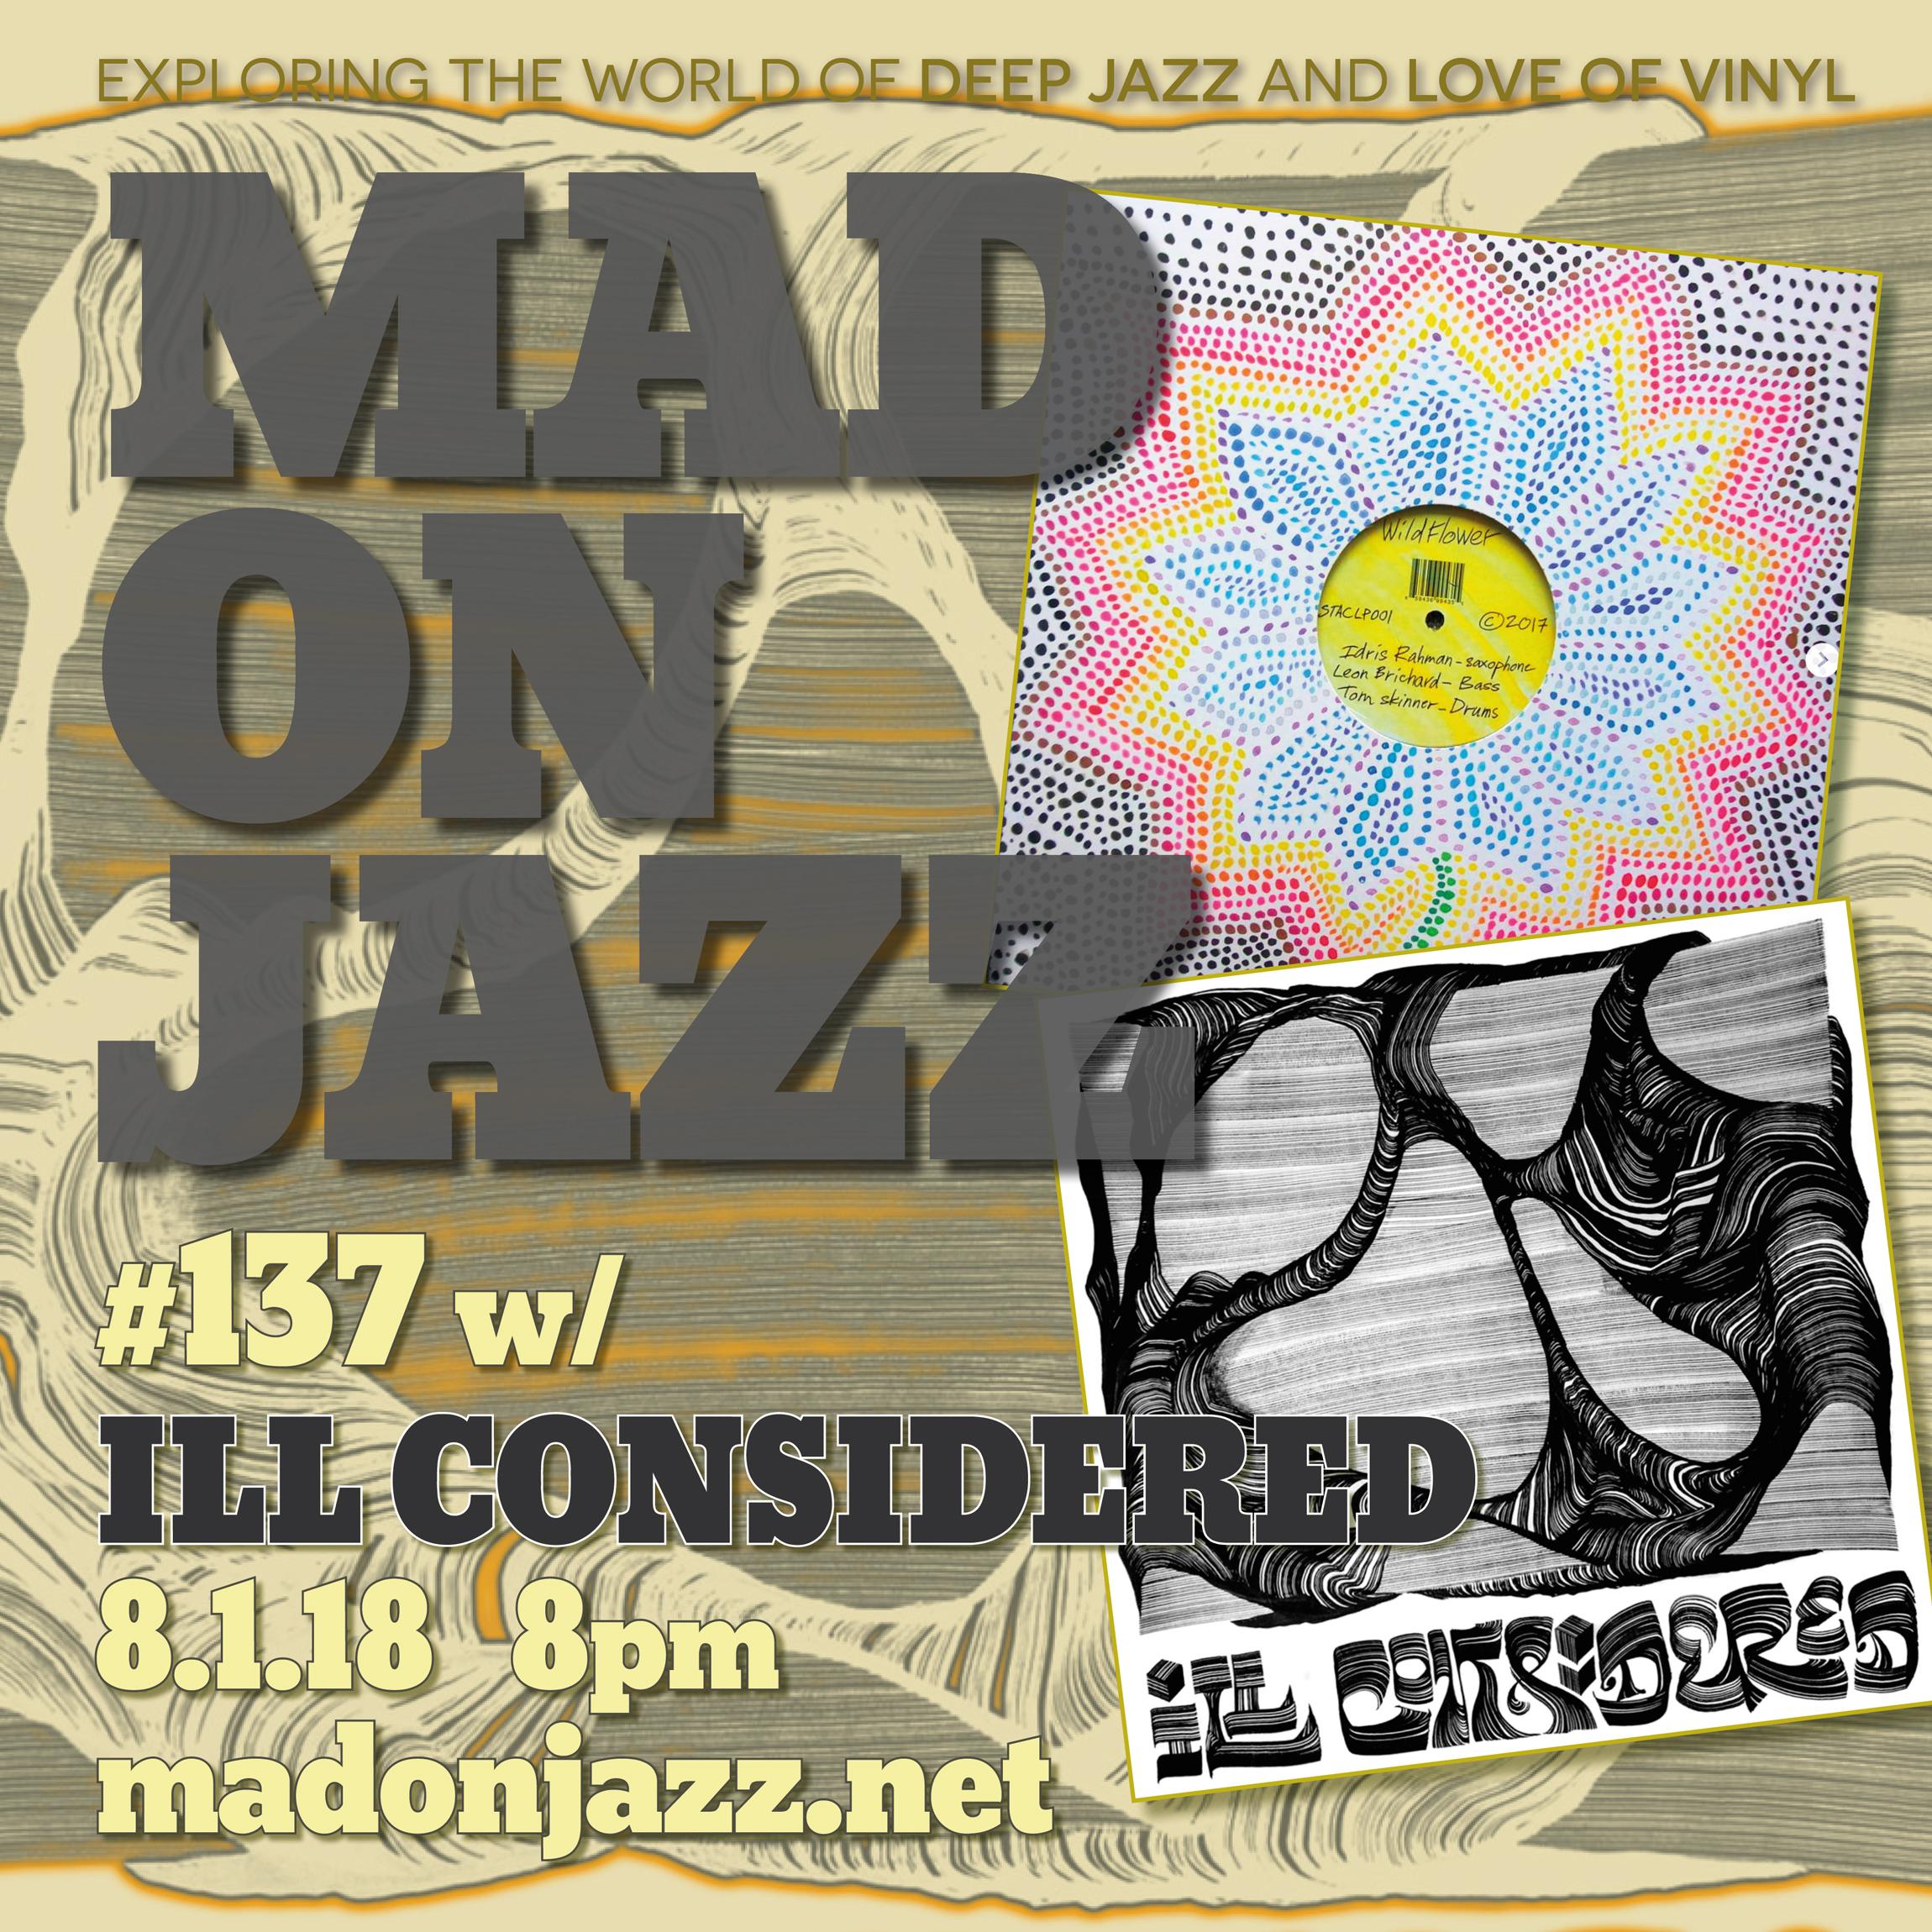 MADONJAZZ #137 w/ Ill Considered London